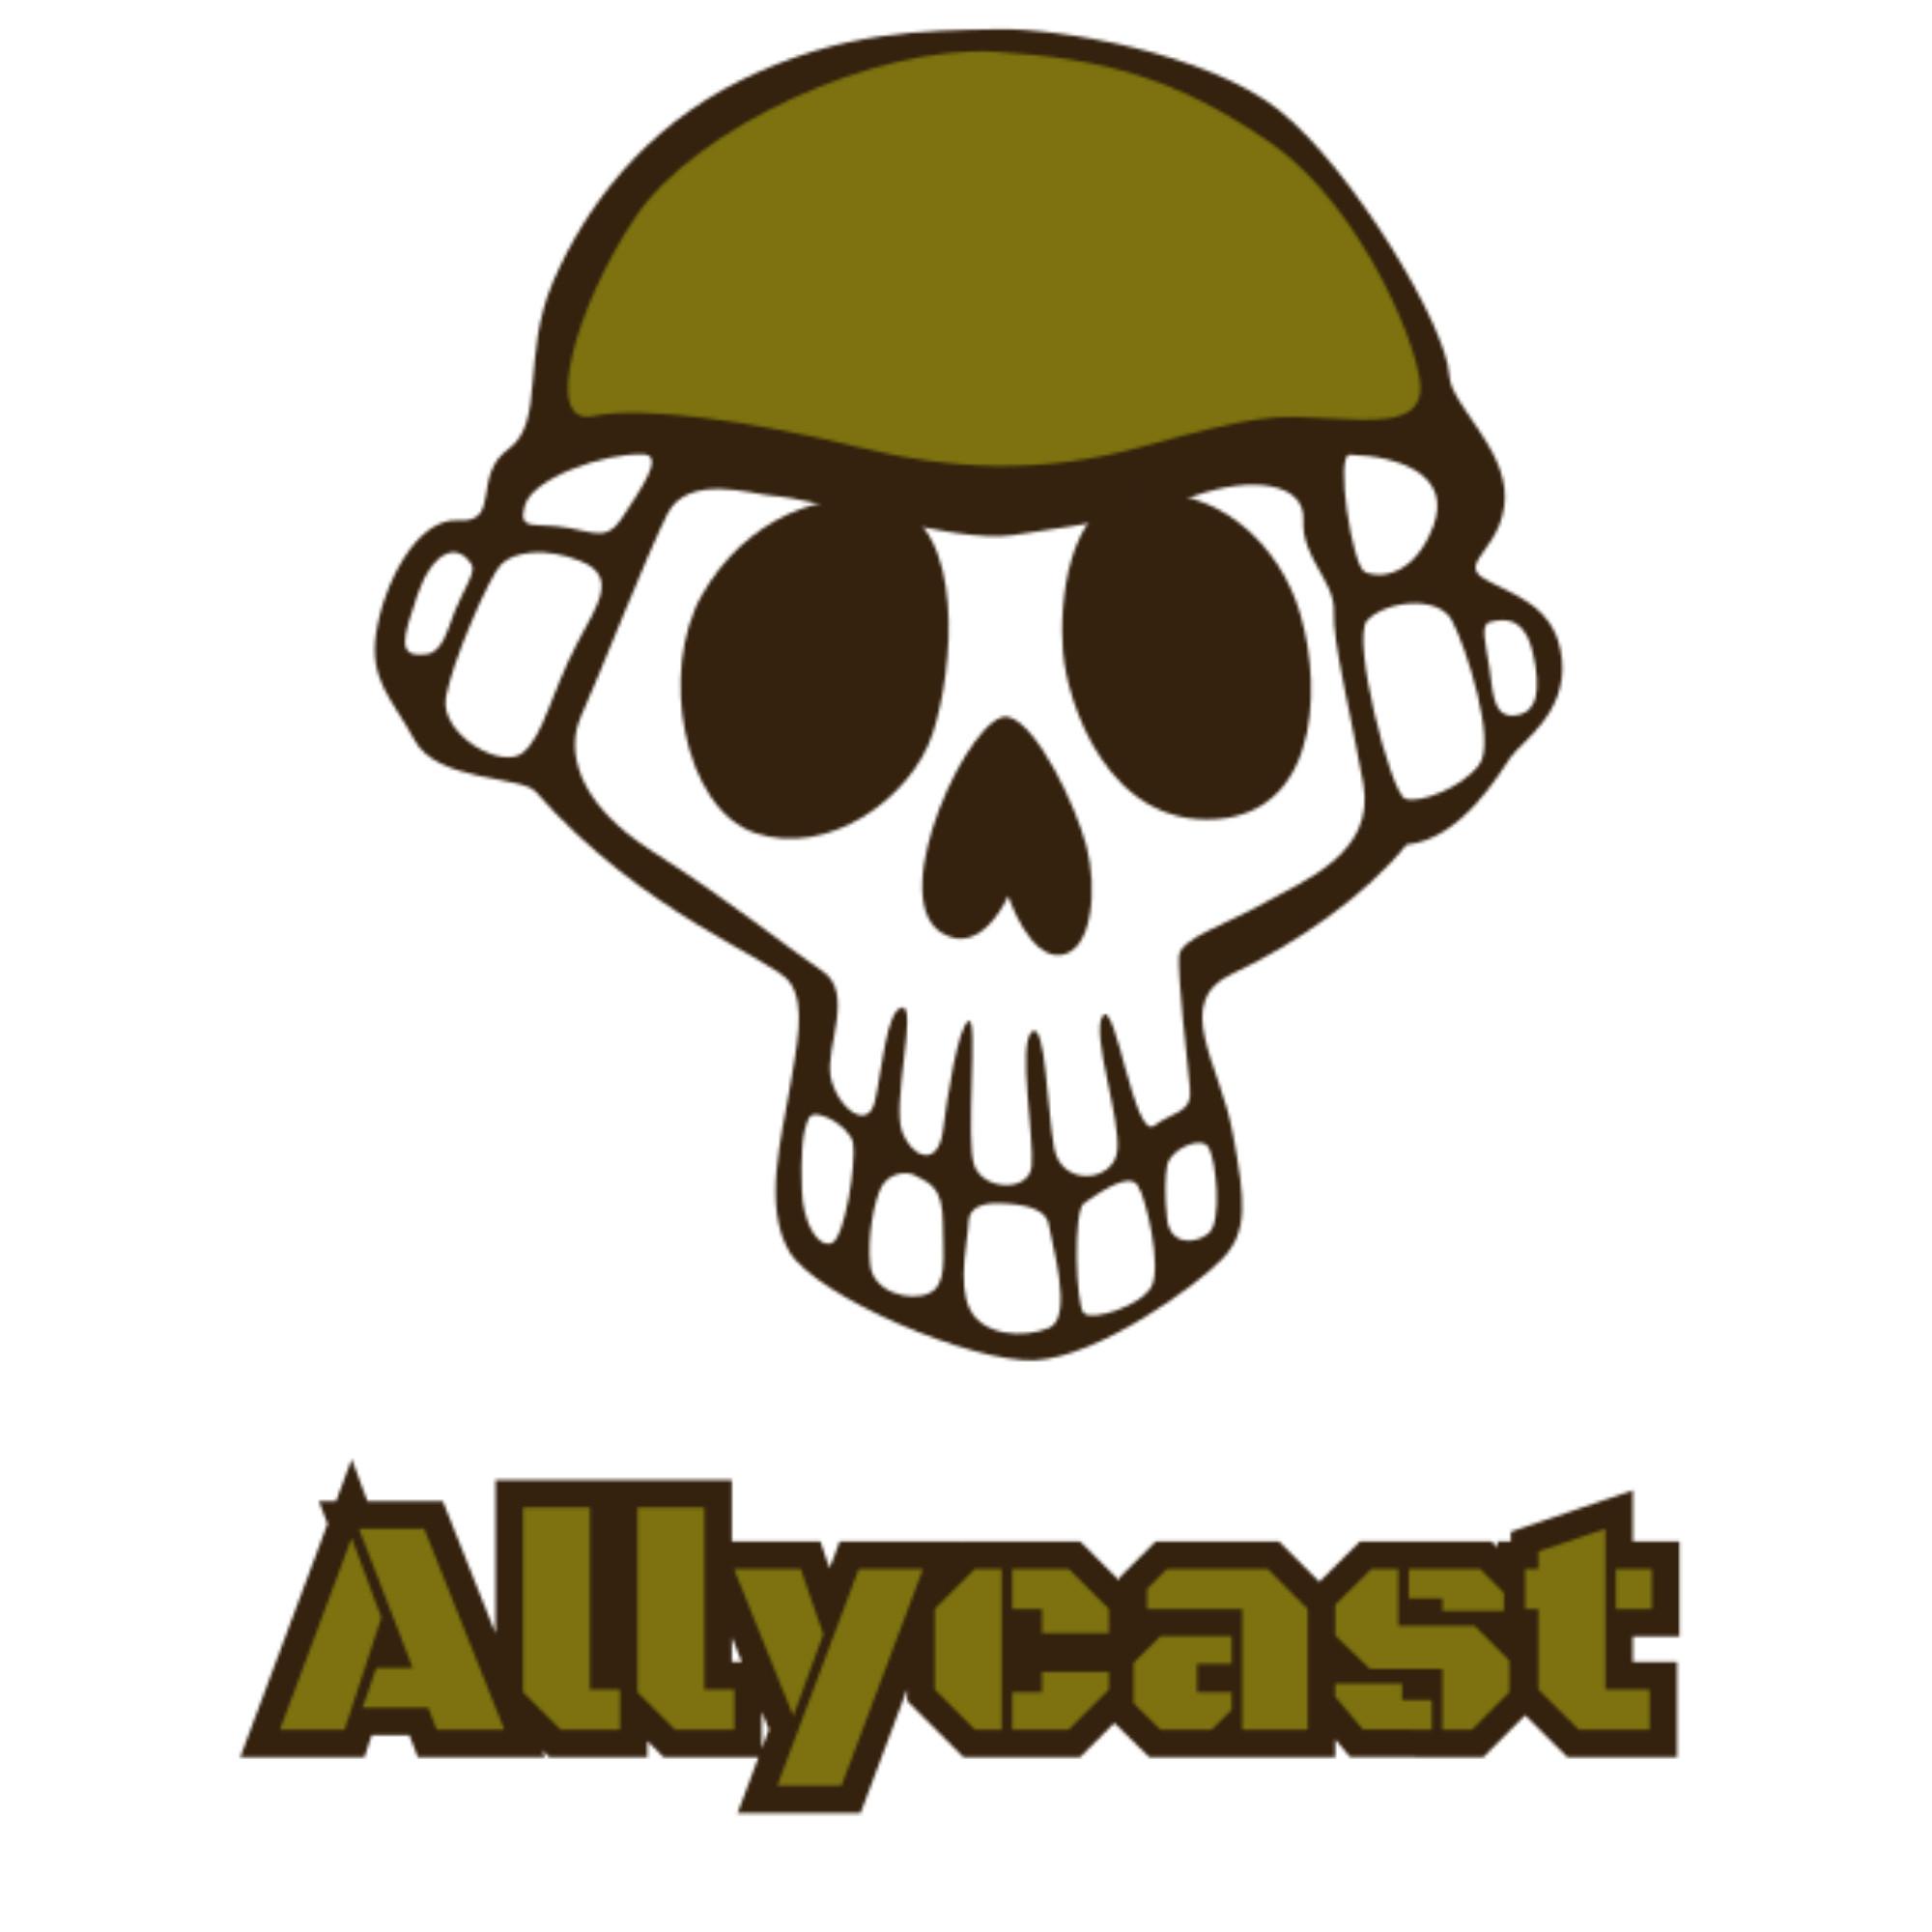 The Allycast show art